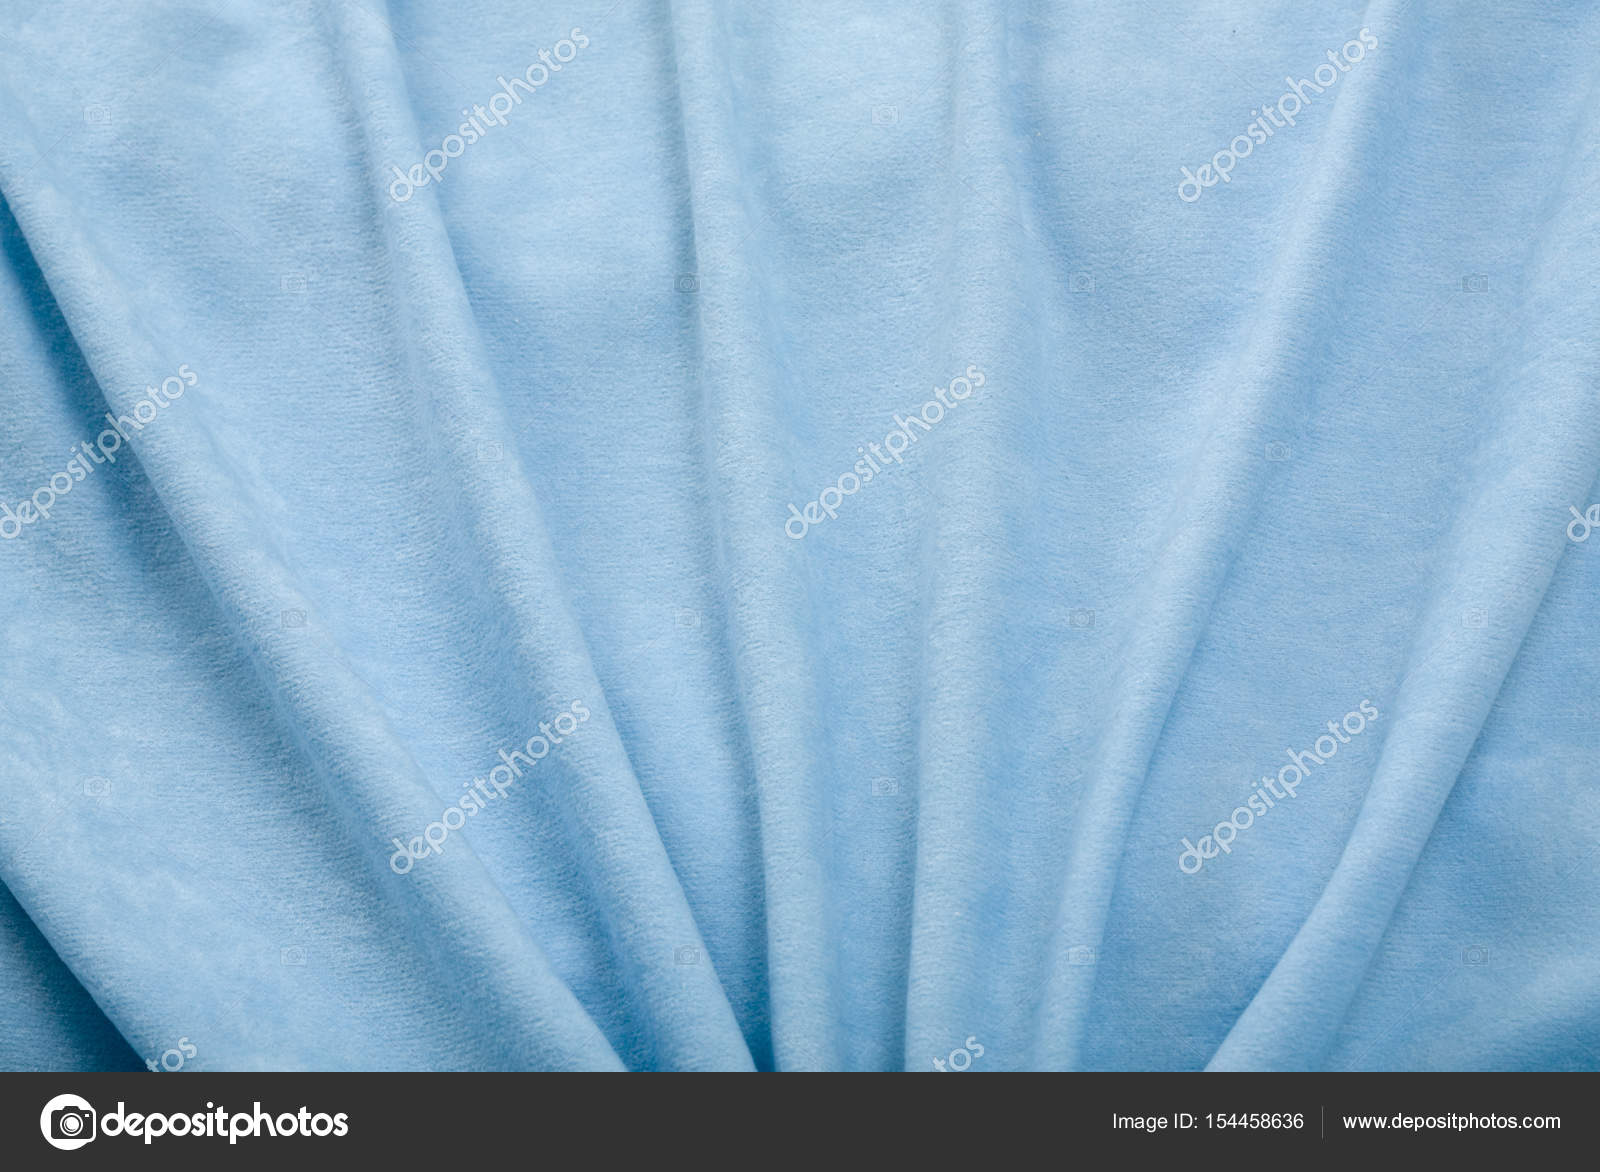 https://st3.depositphotos.com/5080845/15445/i/1600/depositphotos_154458636-stockafbeelding-blauwe-velours-gordijnen.jpg